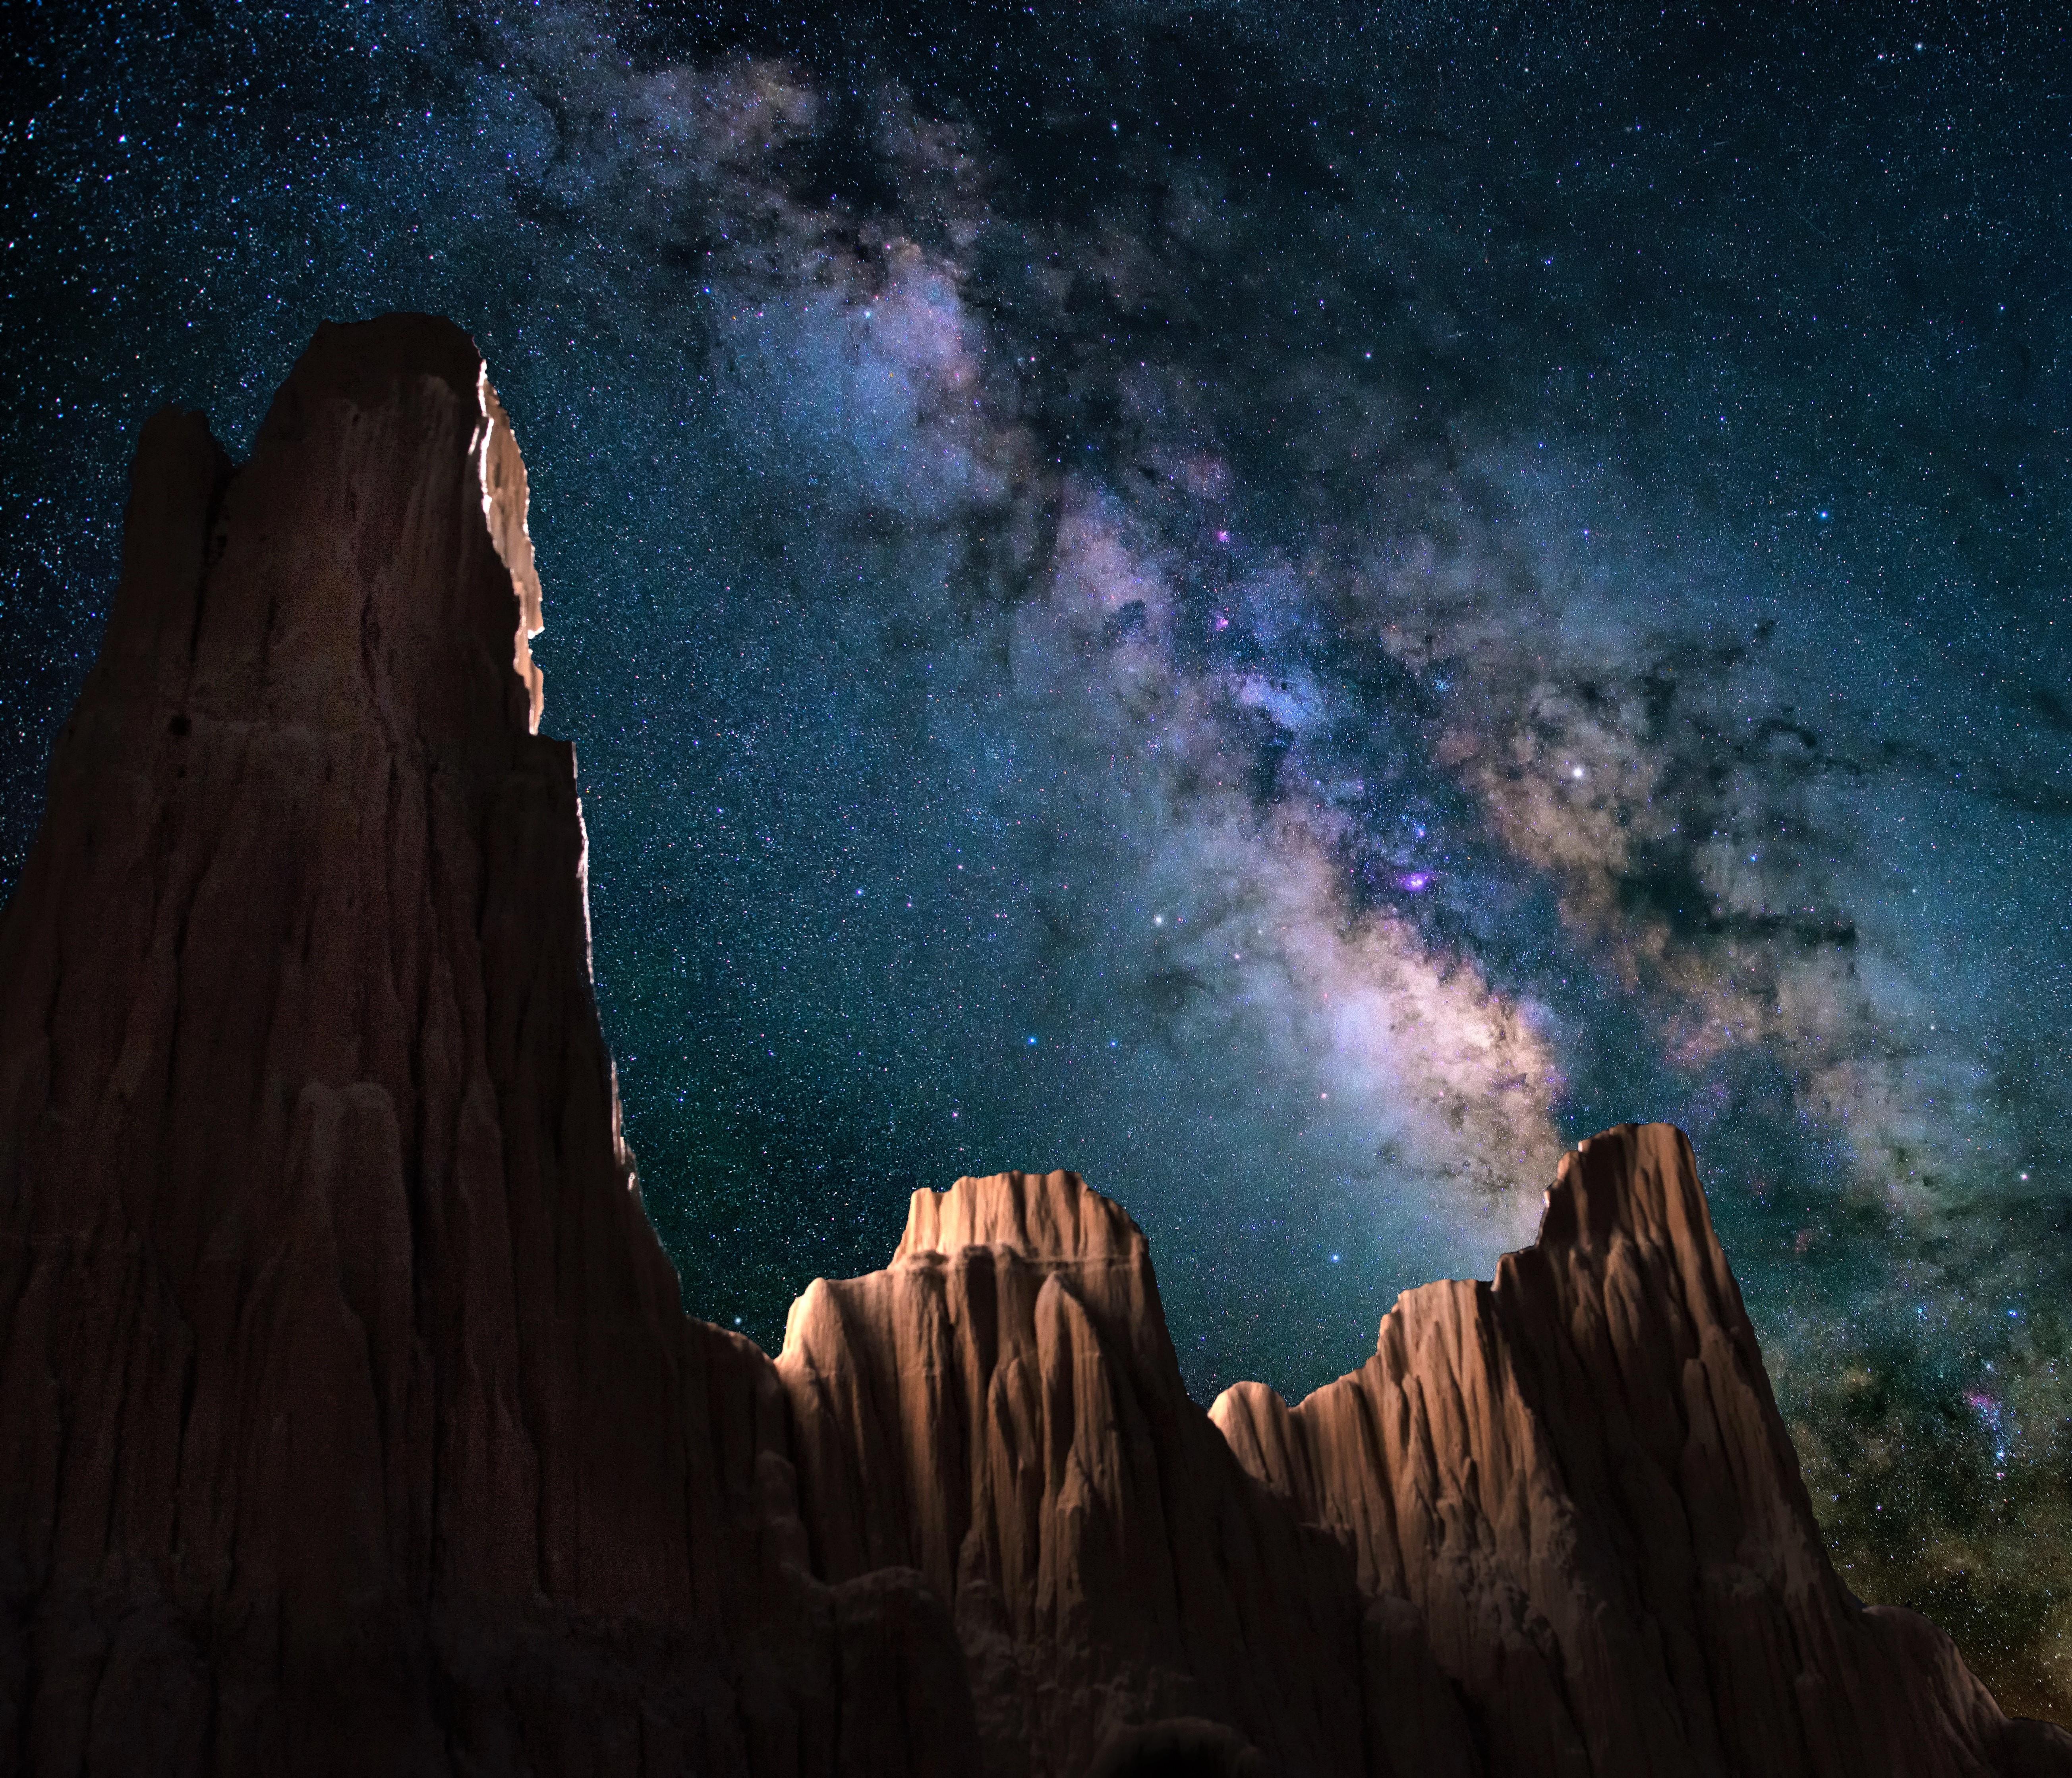 Milky Way Wallpaper: Earth Galaxy Milky Way Mountain Night Sky Starry Sky Stars